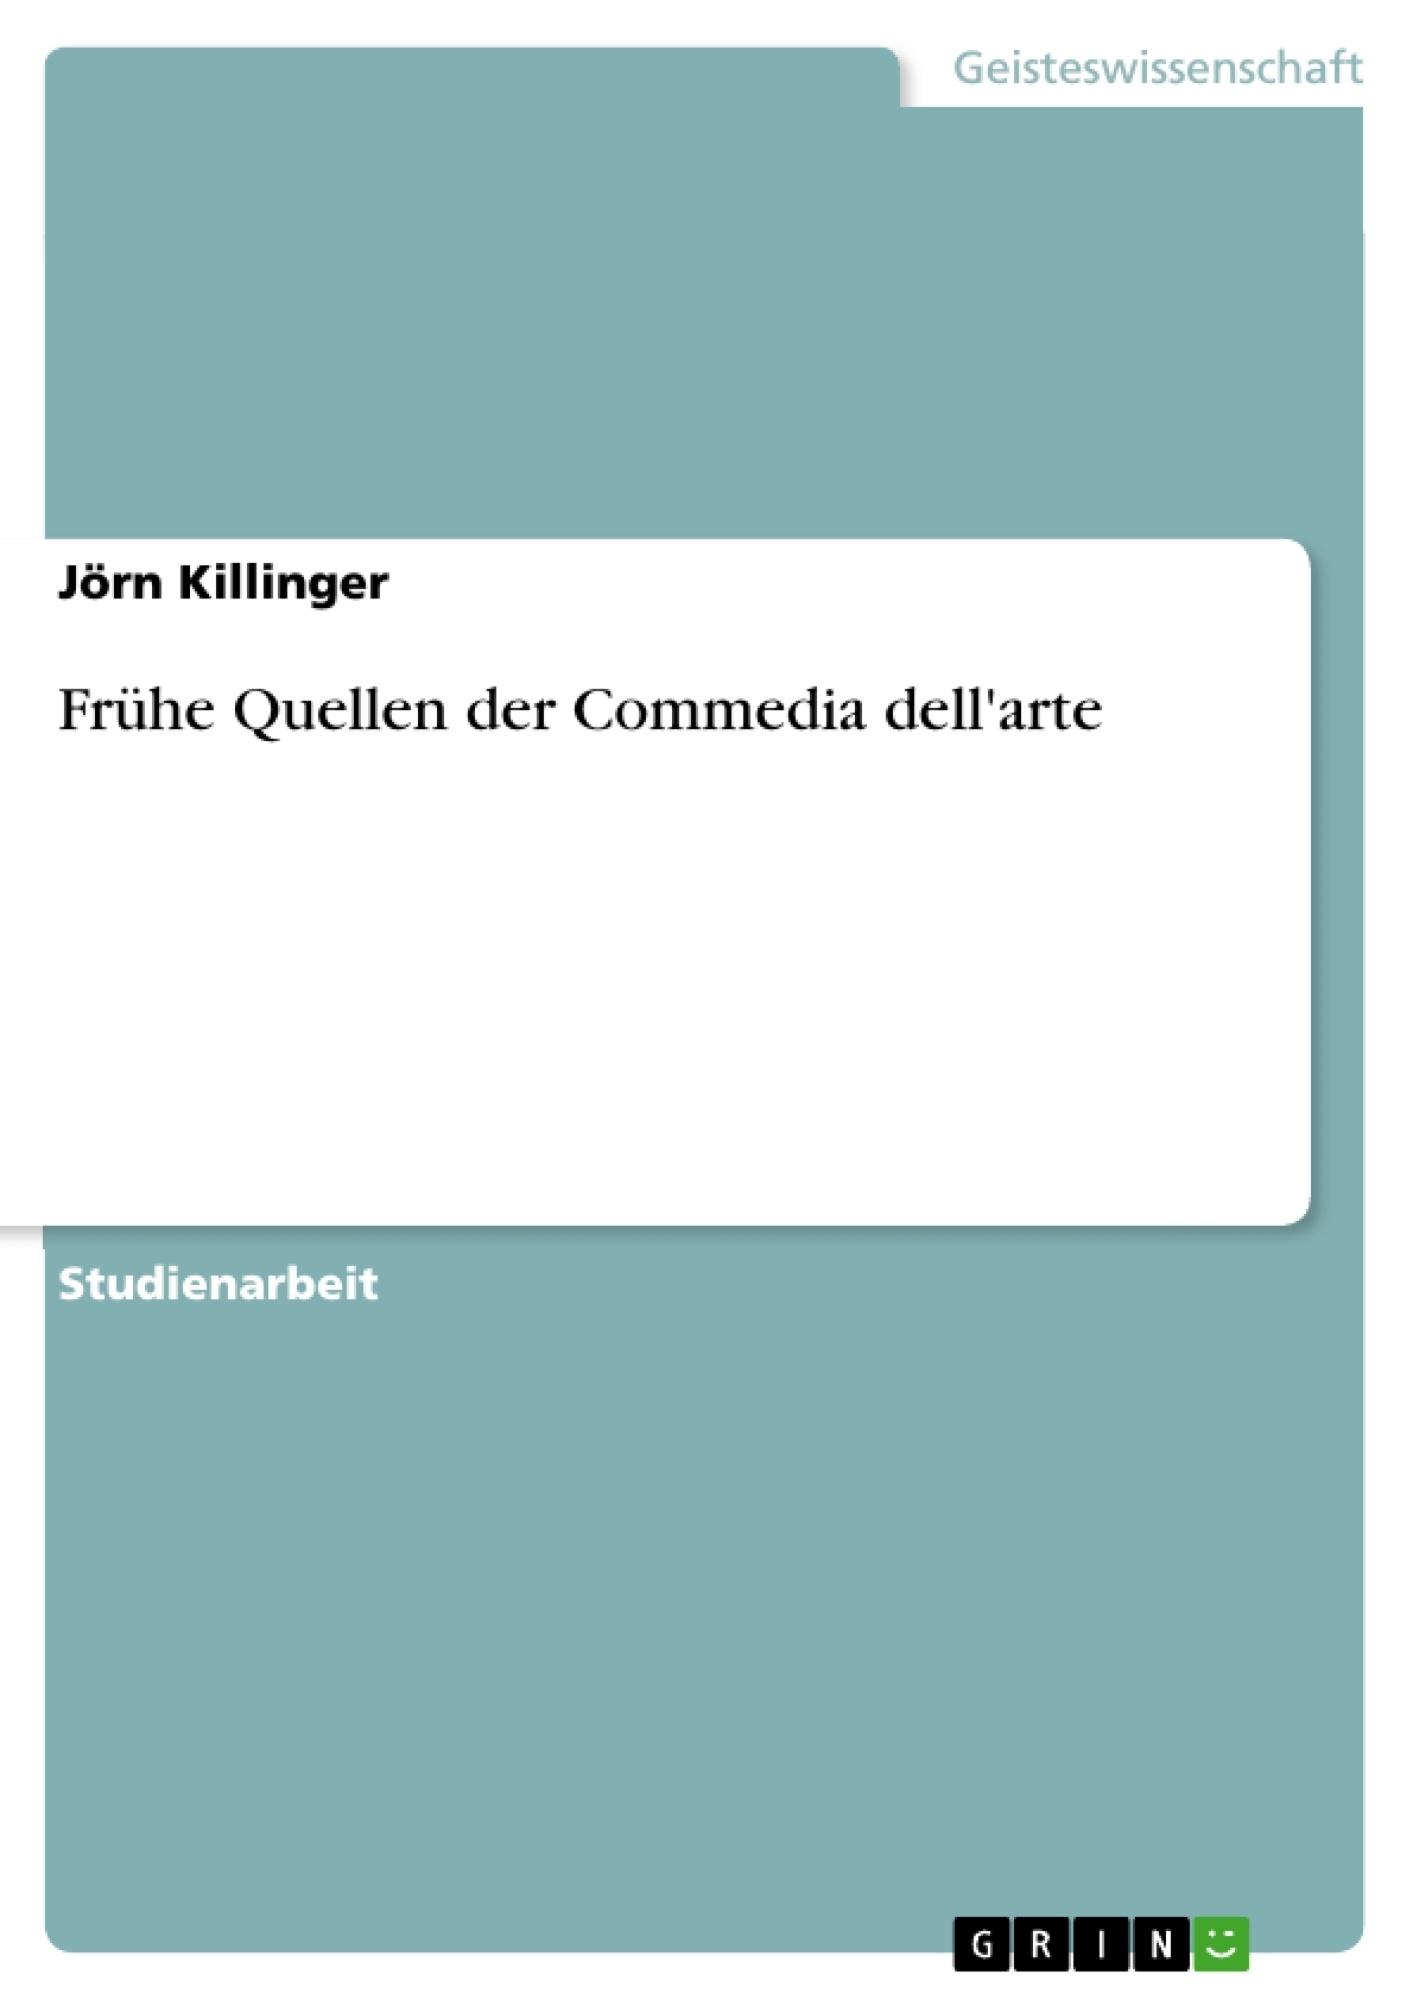 Titel: Frühe Quellen der Commedia dell'arte